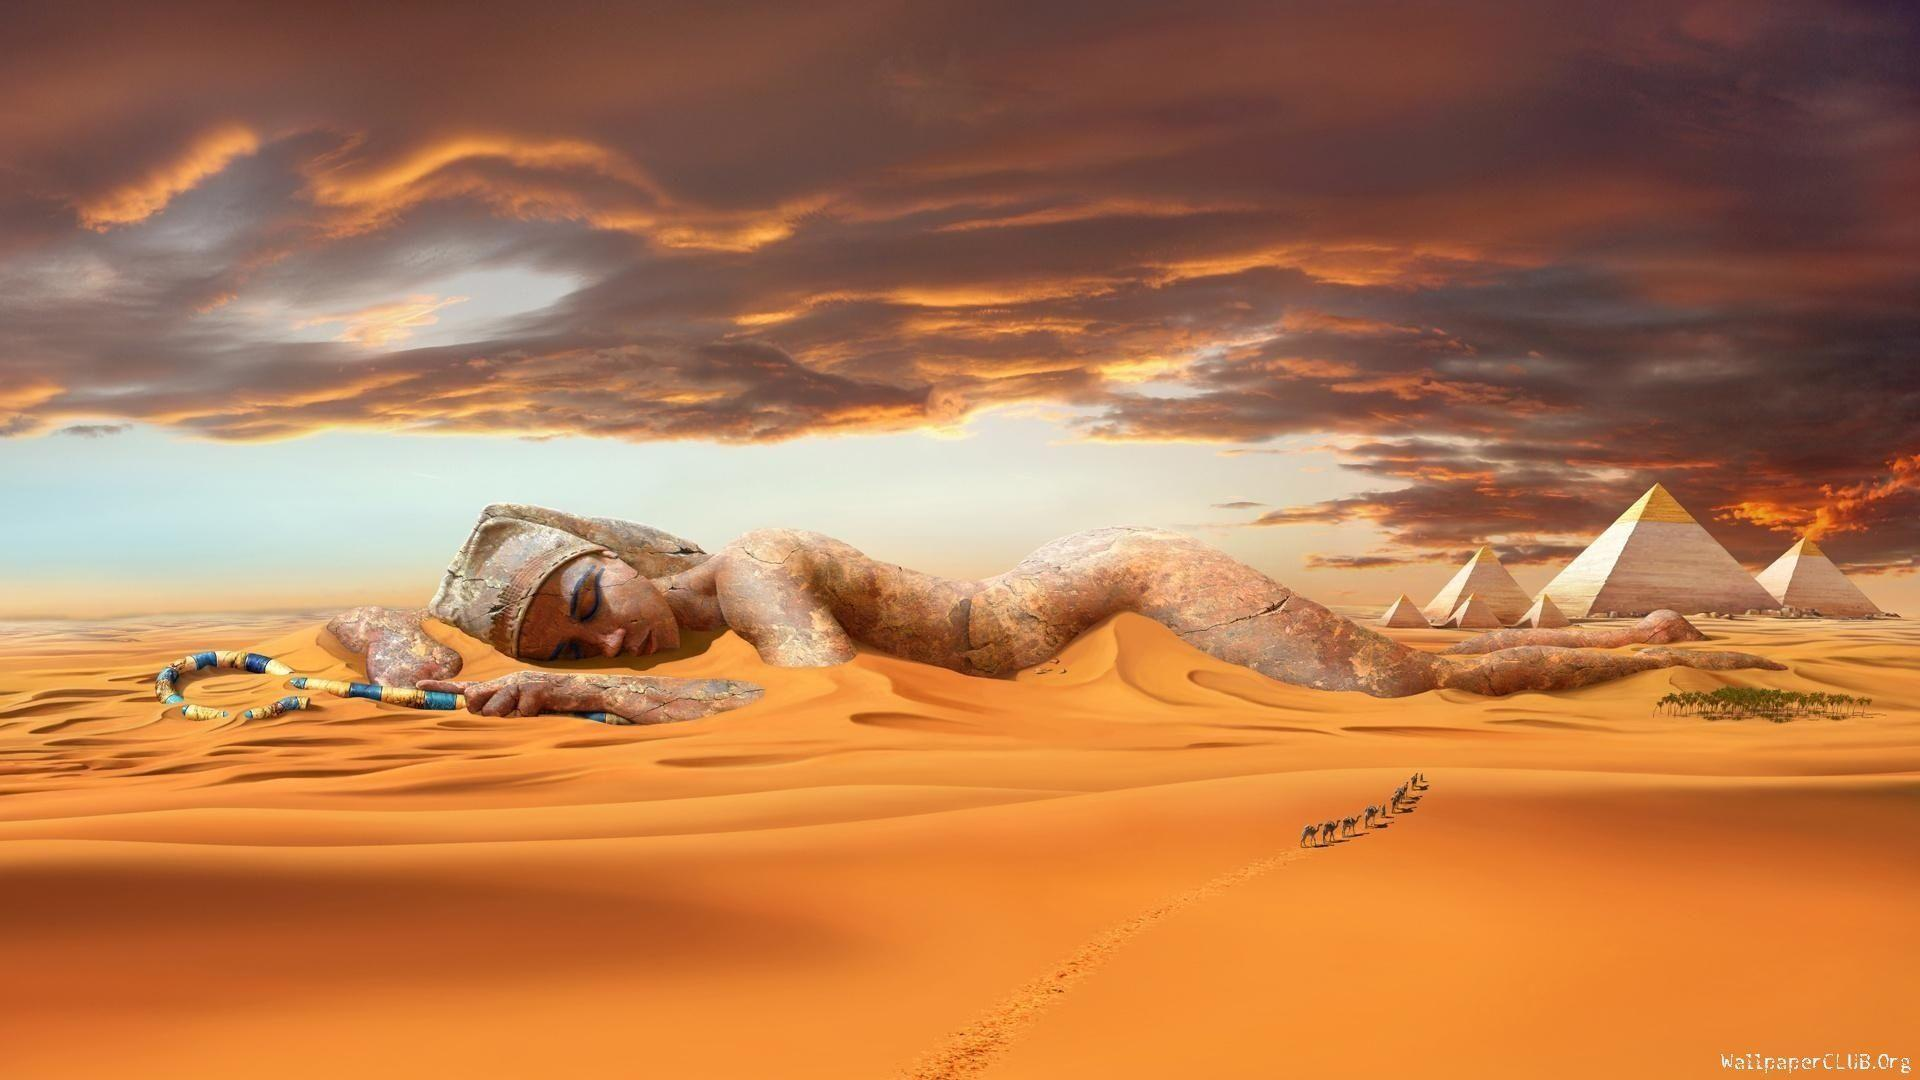 Egyptian Wallpaper Egyptian Desktop Wallp...